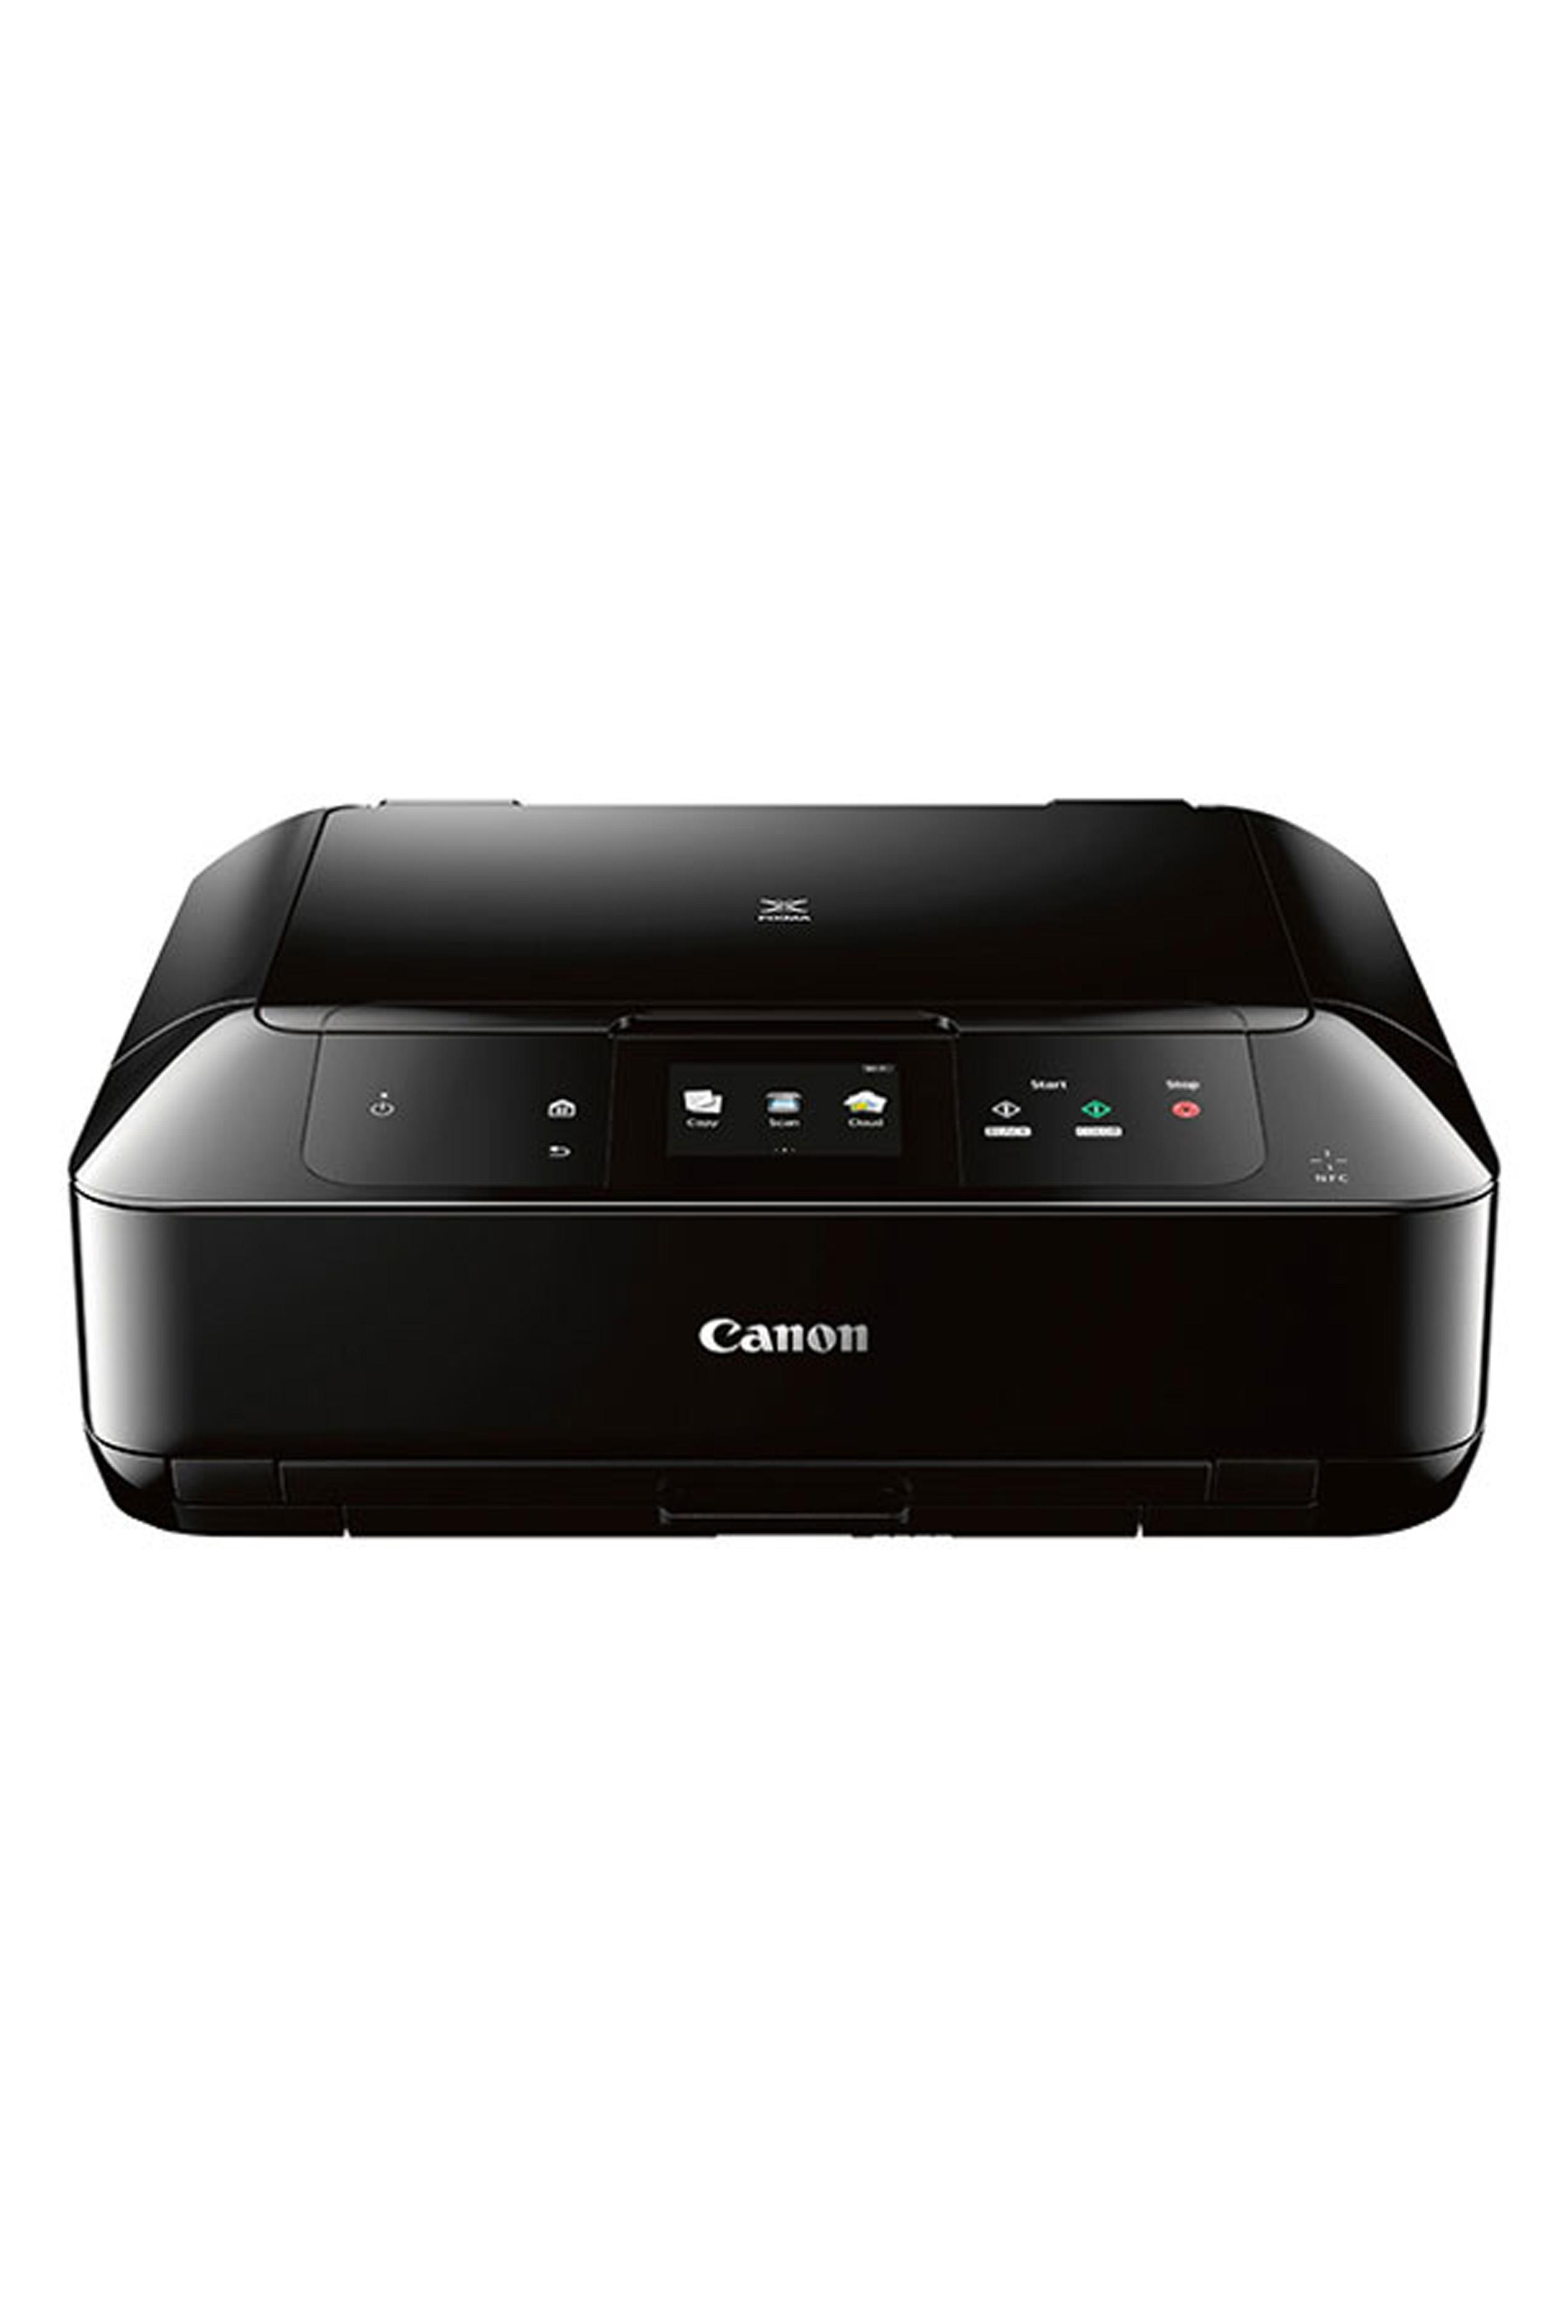 Canon PIXMA MG7720 Black (15ipm/10ipm)